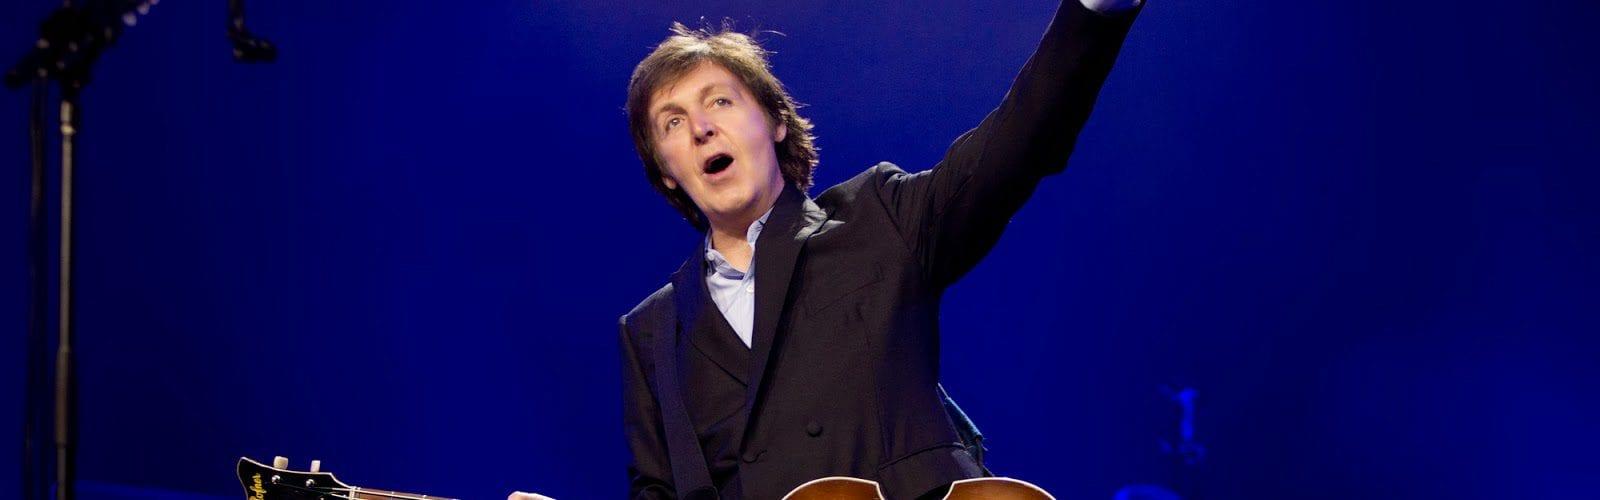 Paul McCartney, Farm Aid 2018 Score Tops Spots On Thursday Best-Sellers